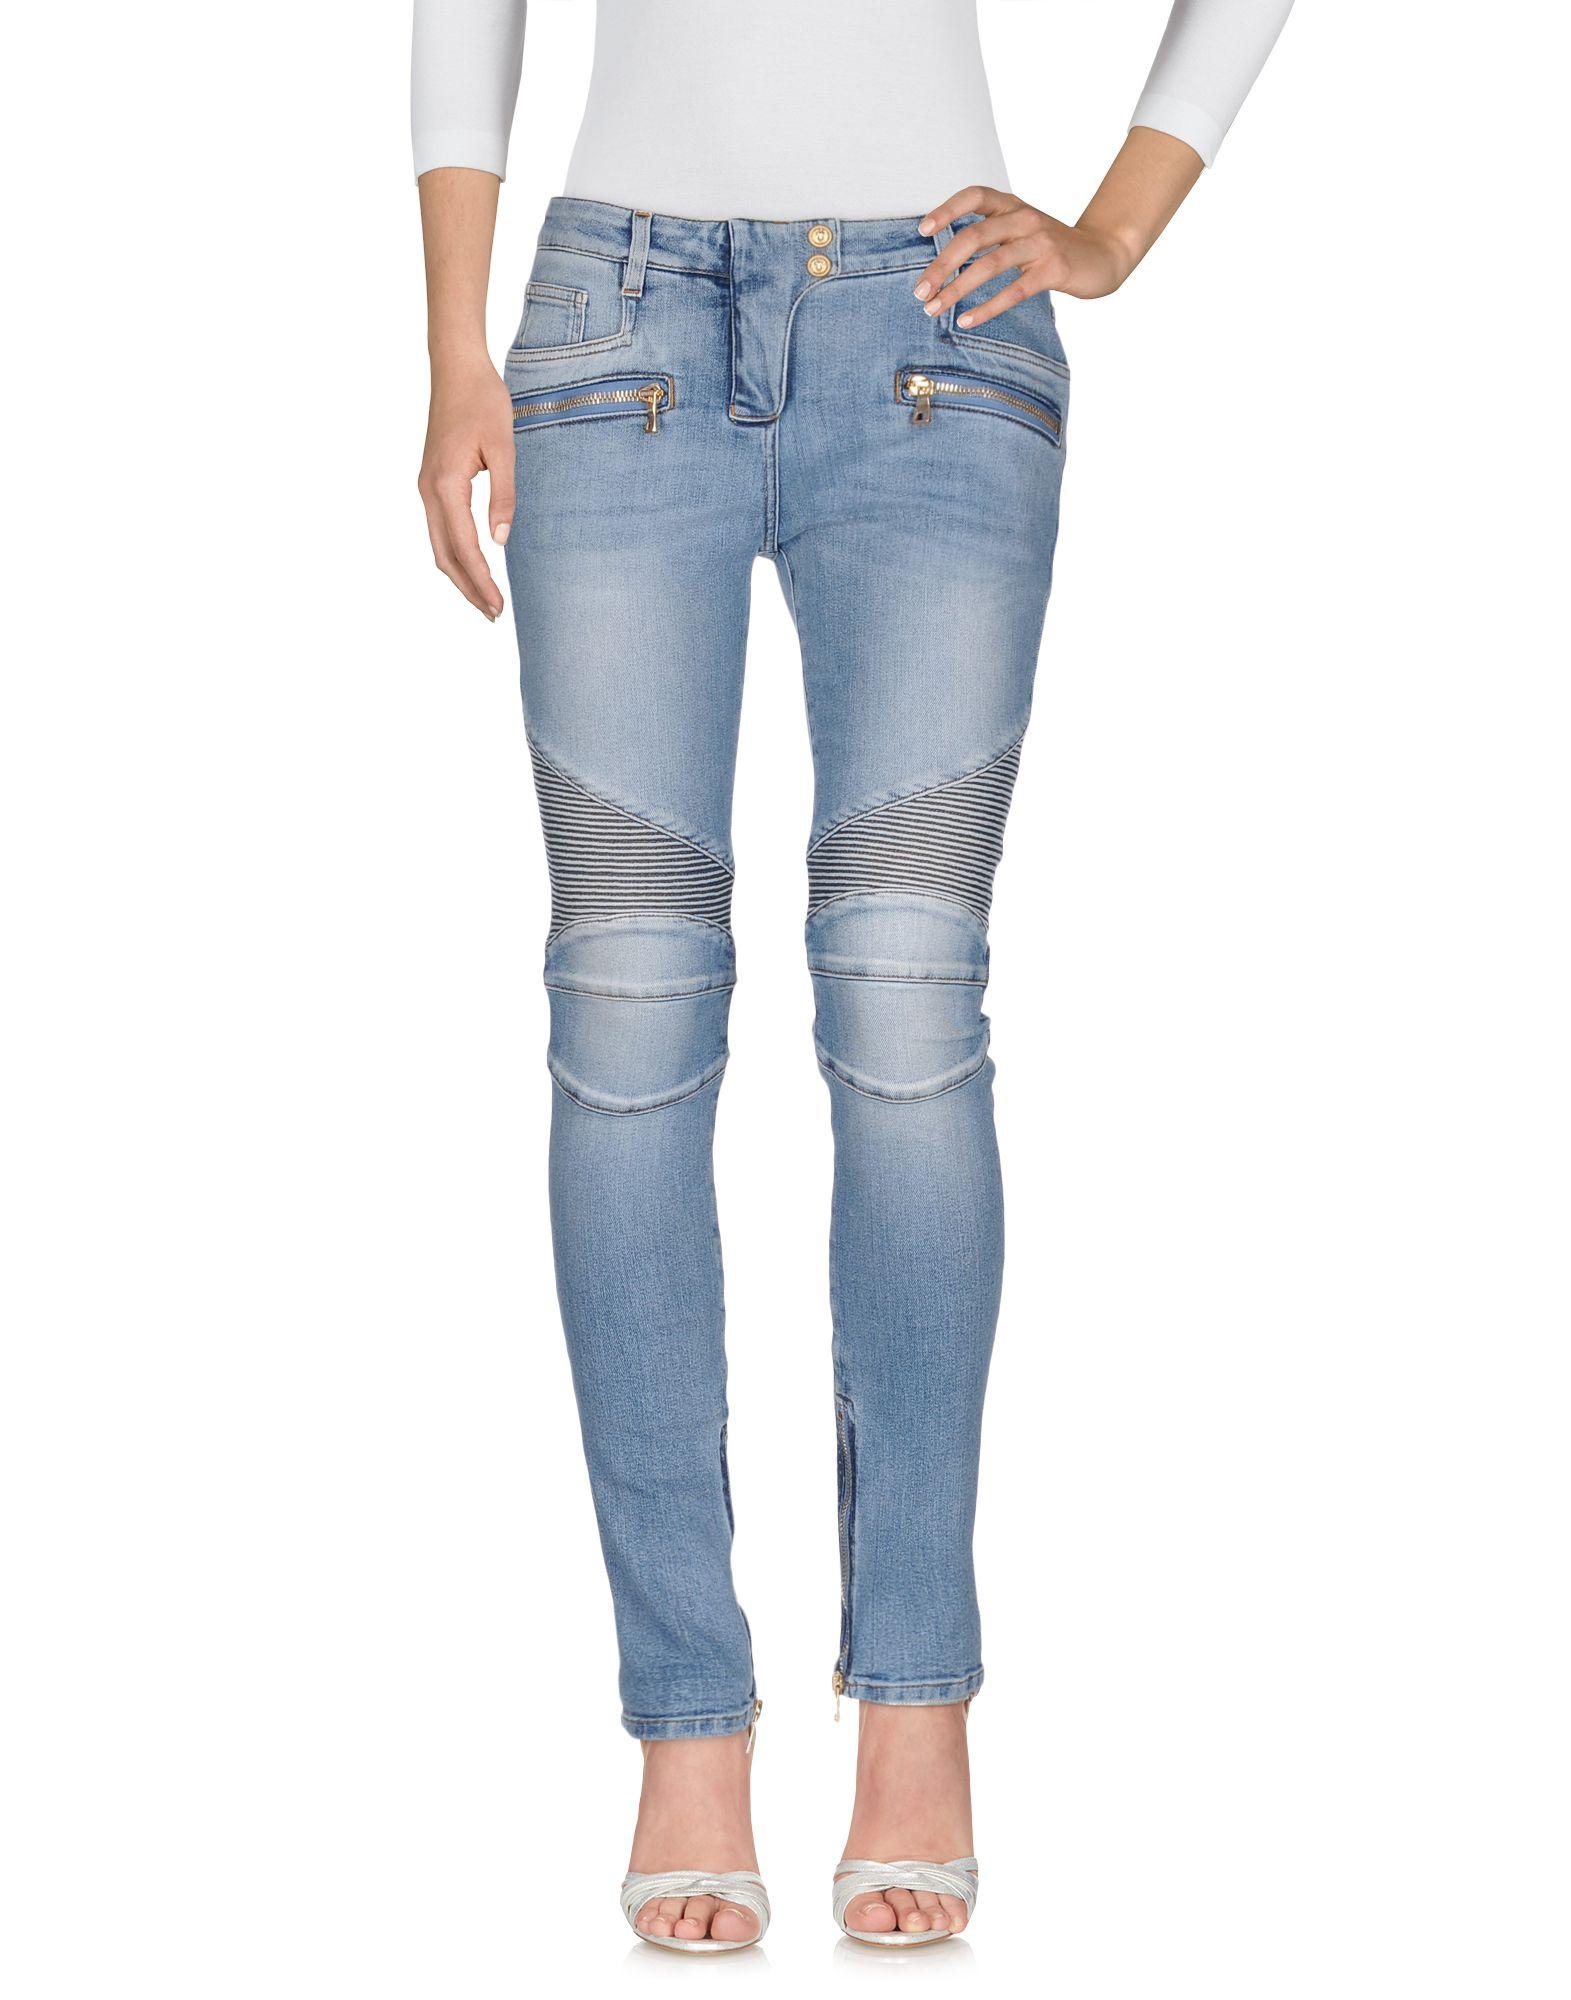 PIERRE BALMAIN Джинсовые брюки женские брюки лэйт светлый размер 50